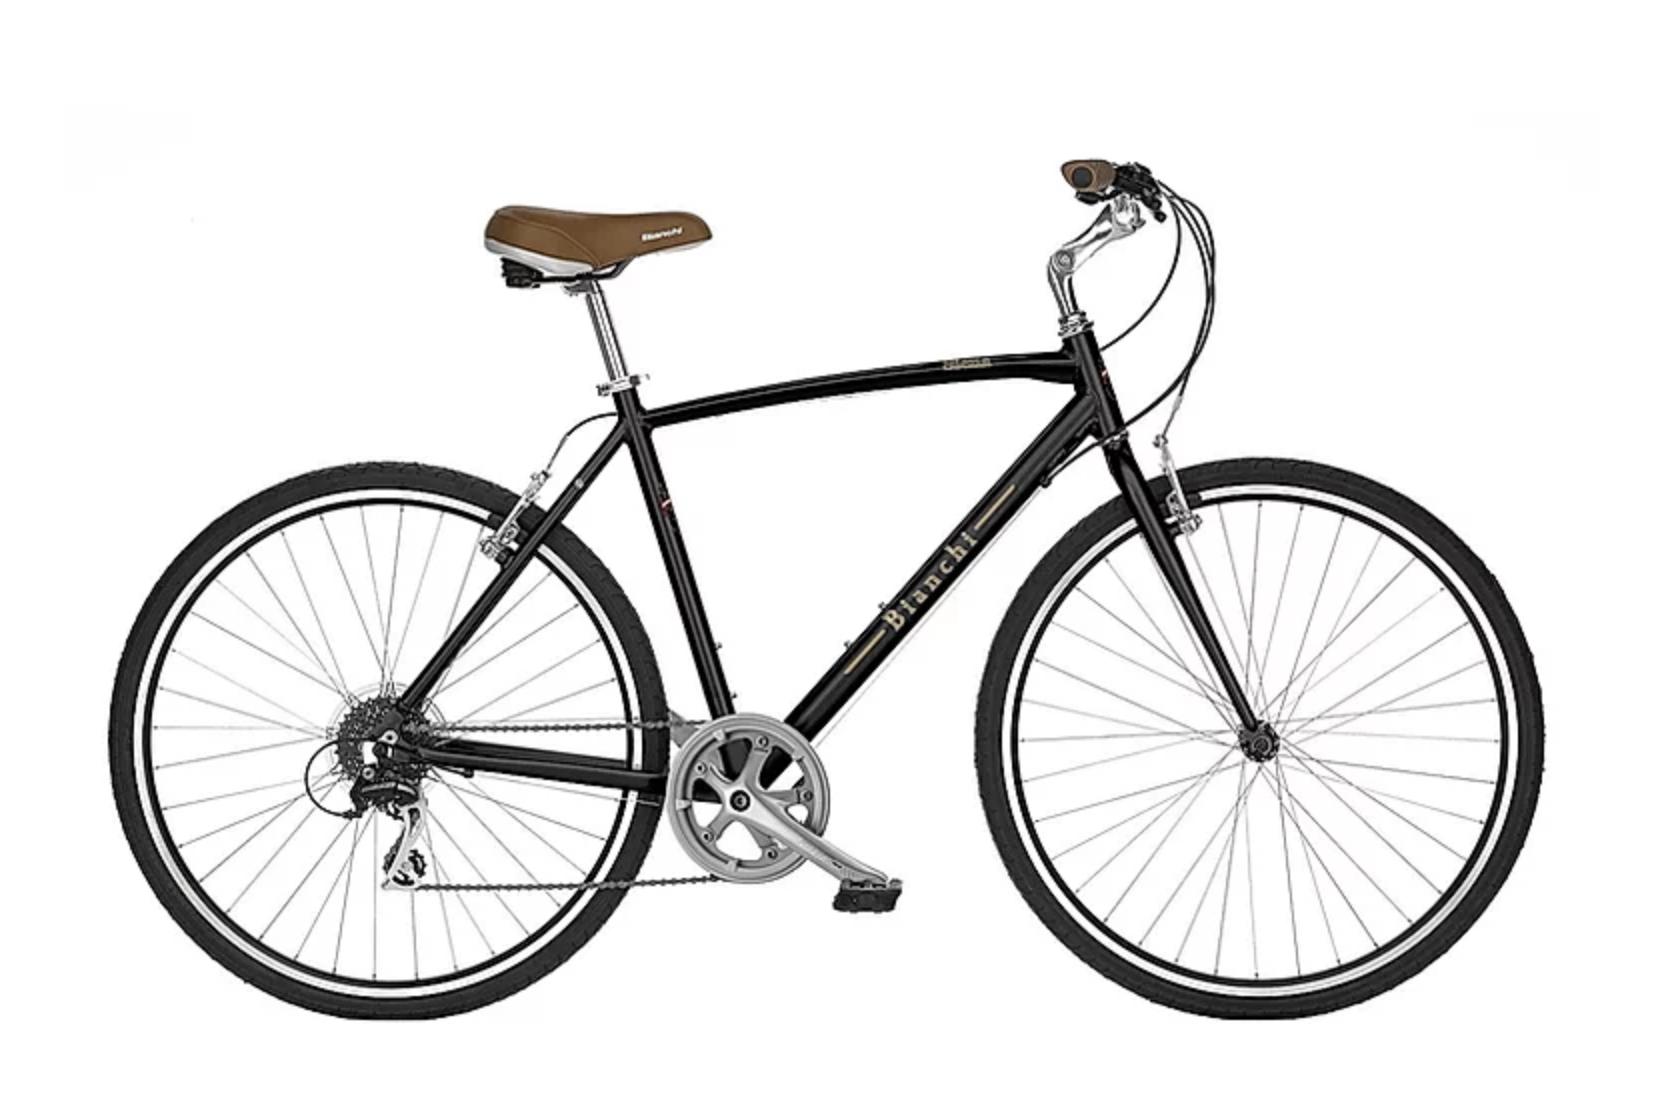 Bianchi siena gent bike rental